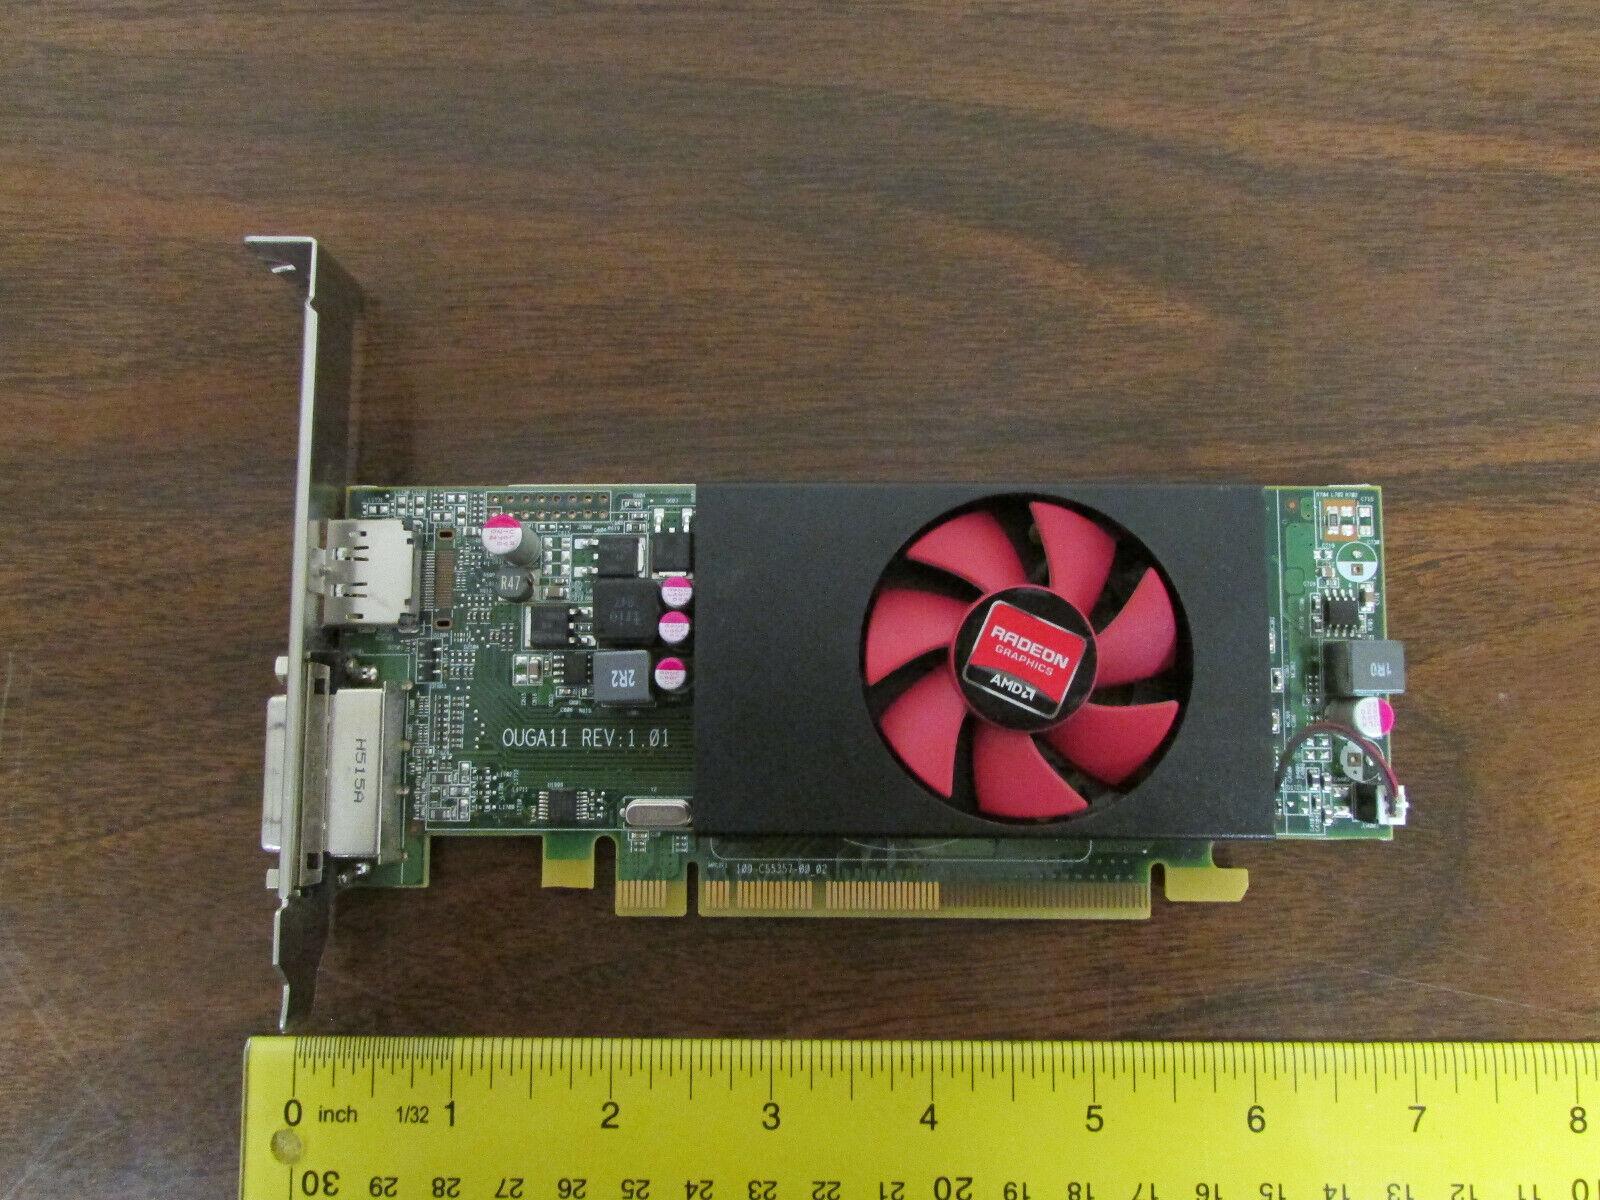 AMD Radeon HD 8490 1-GB DDR3 RAM OUGA11 PCI-E DVI DP Video Graphics Card